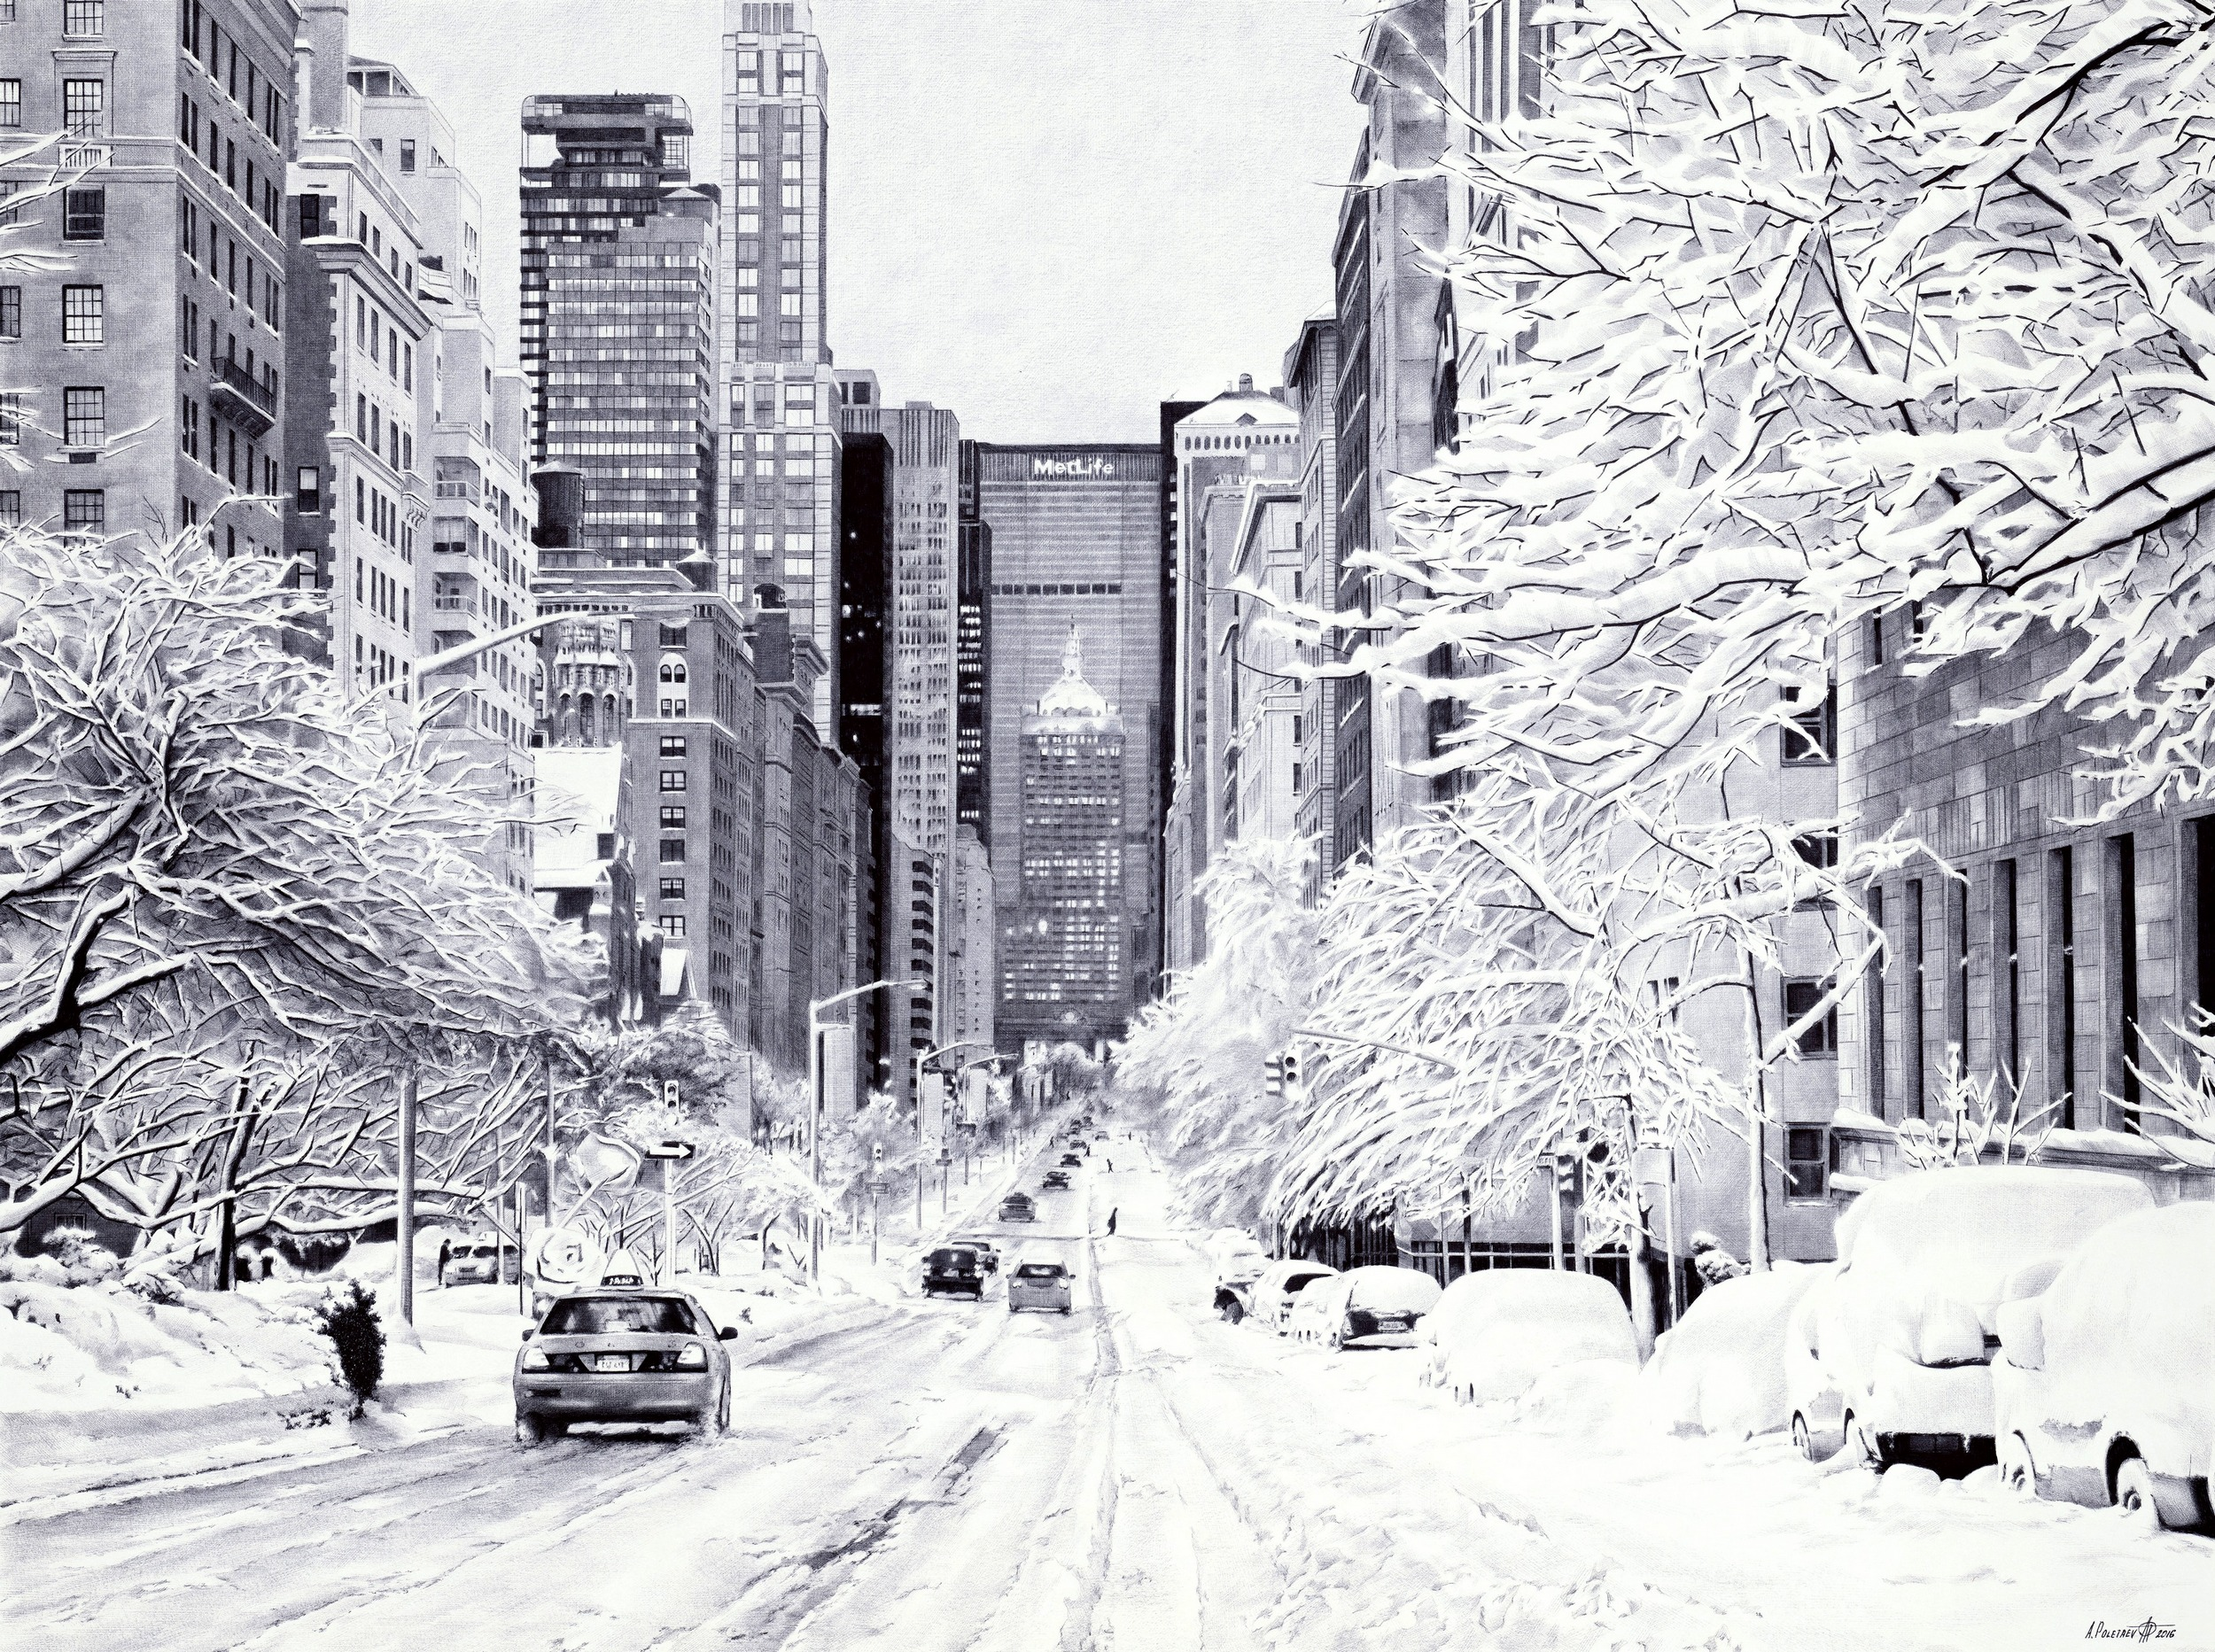 A-SCAN-POLETAEV-Snowy_New_York